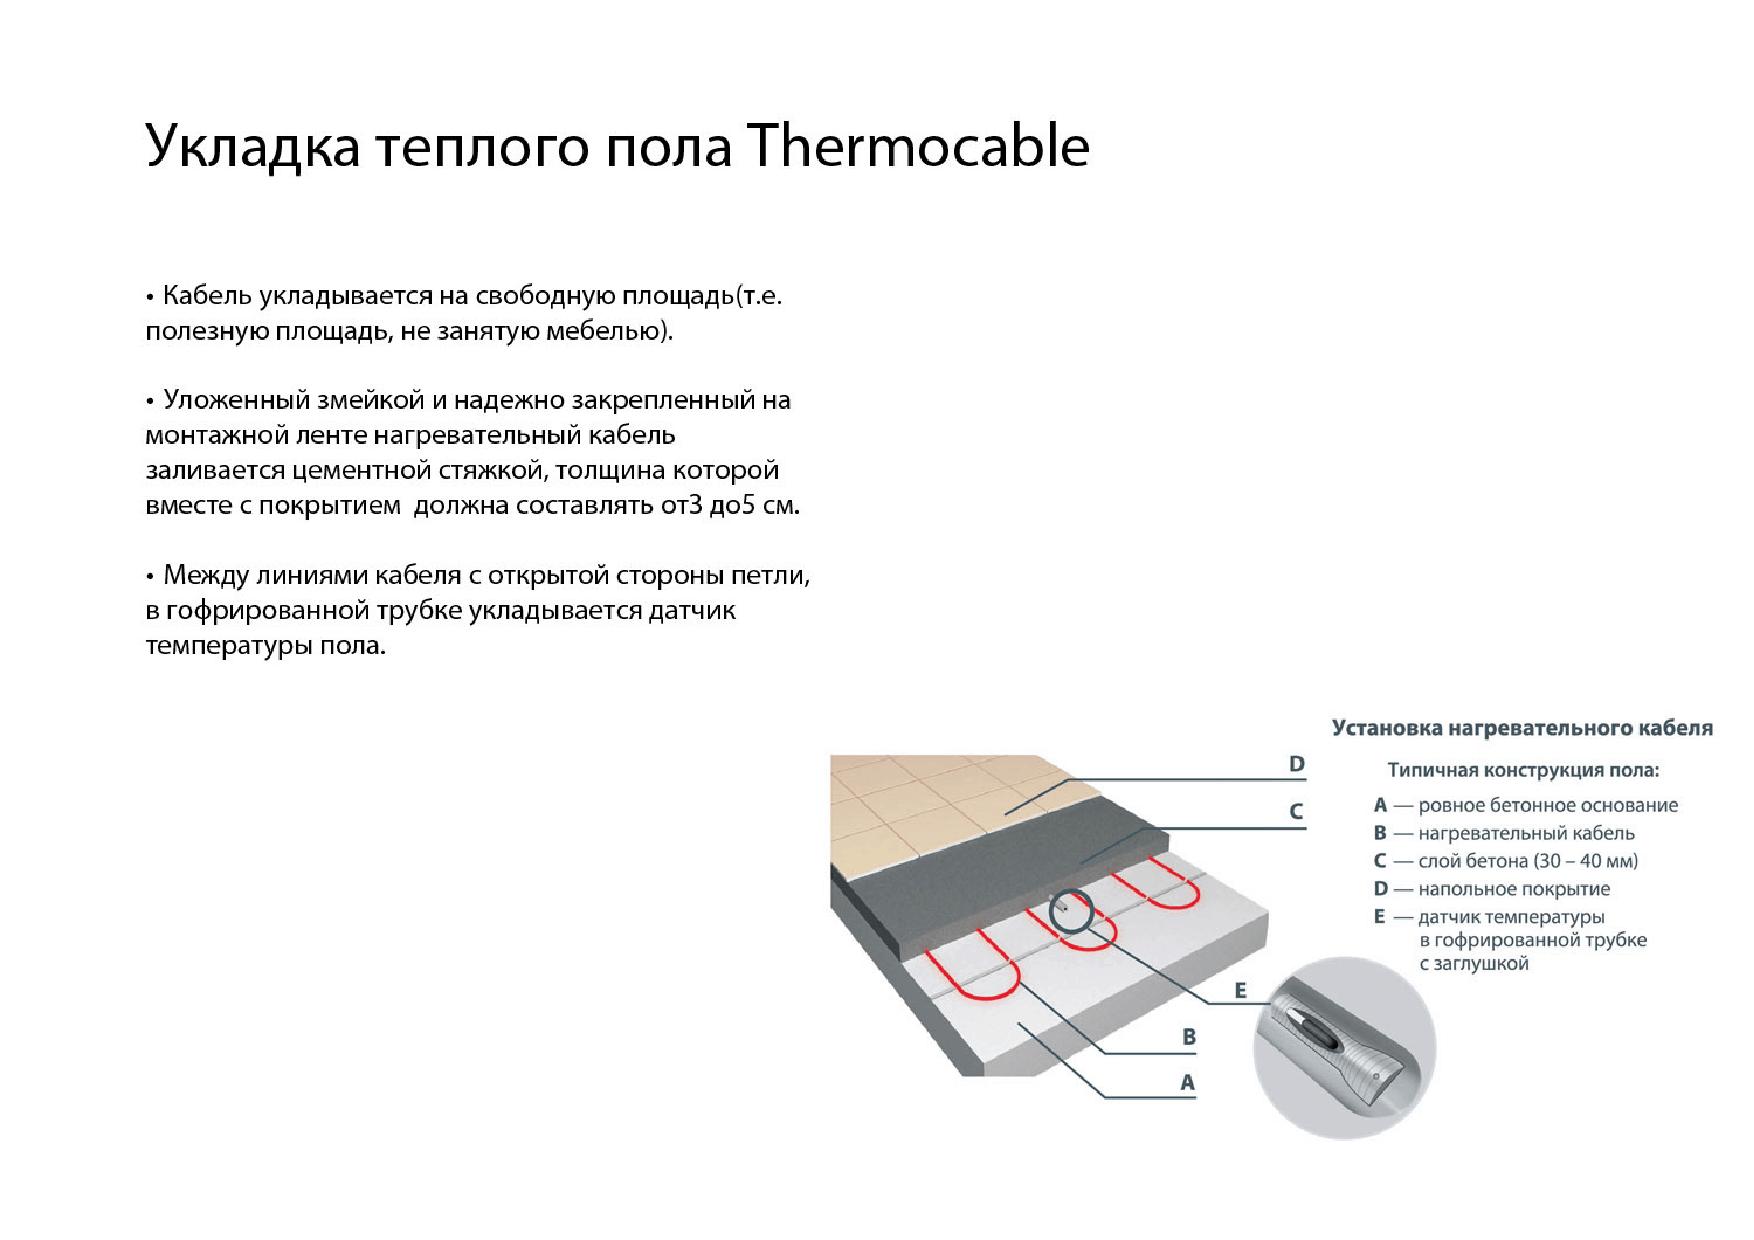 Ukladka-teplogo-pola-Thermocable